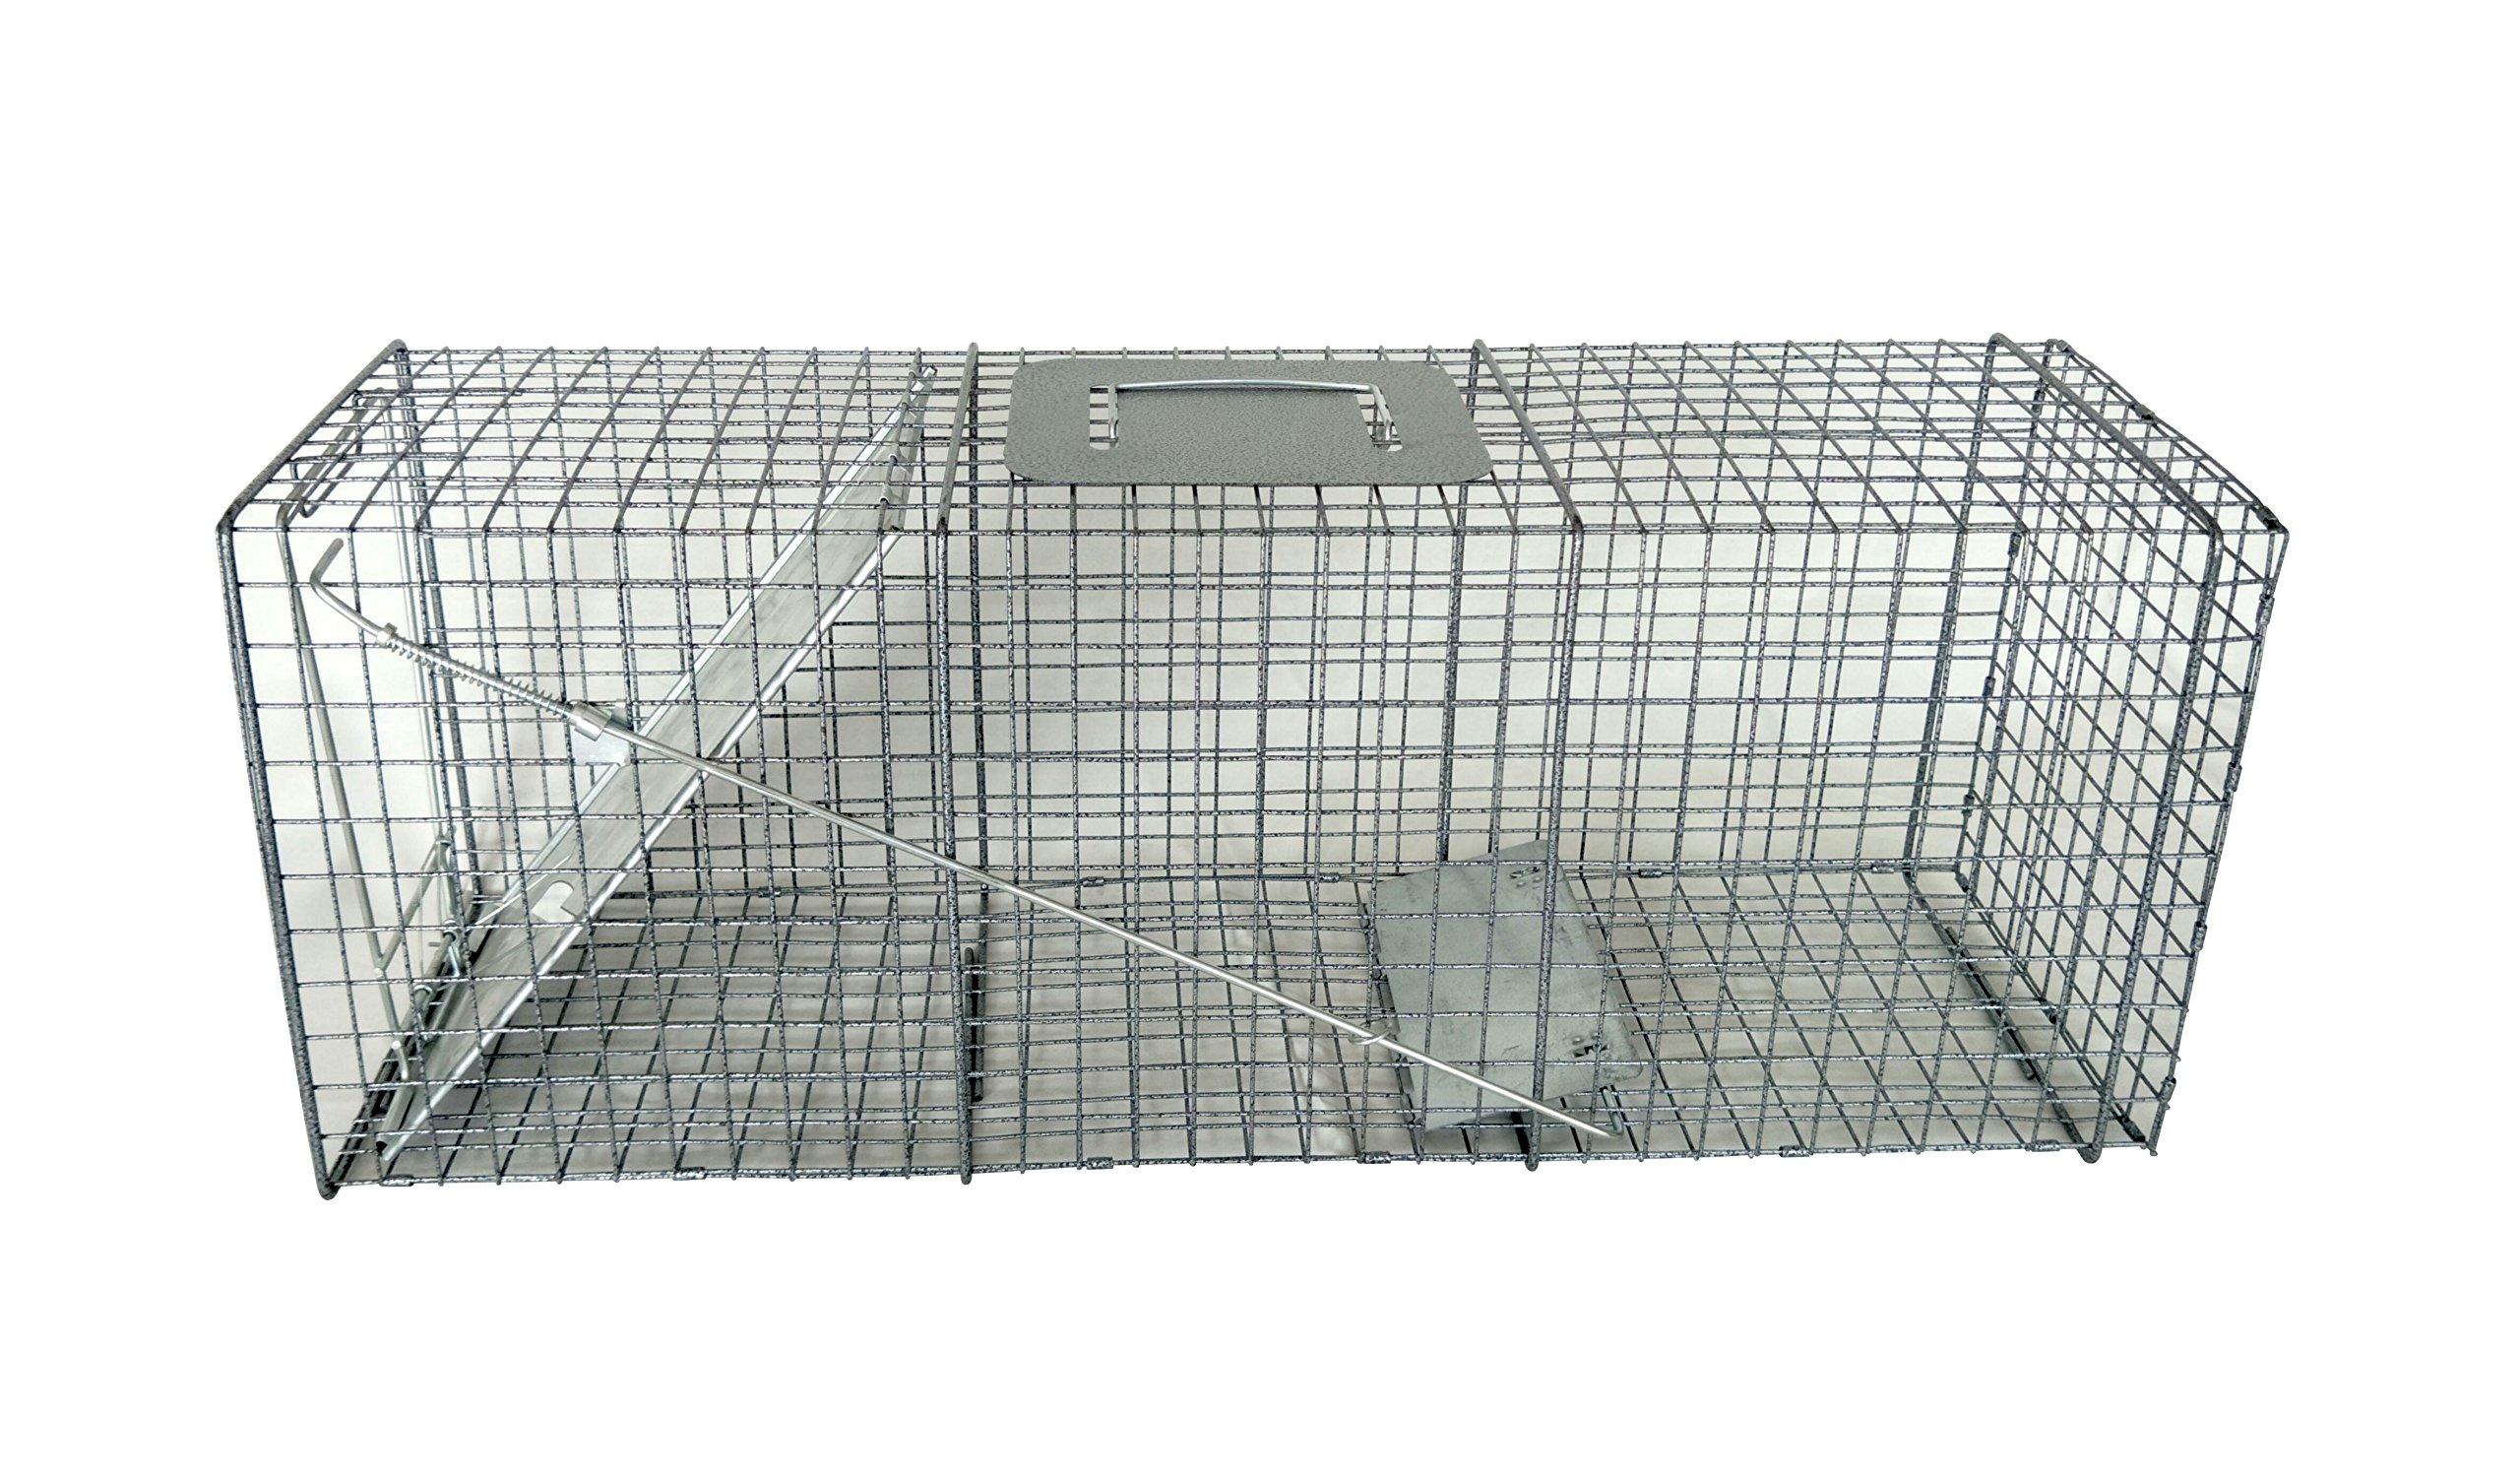 Neocraft 40050 2 Piece Animal Trap, Silver by Neocraft